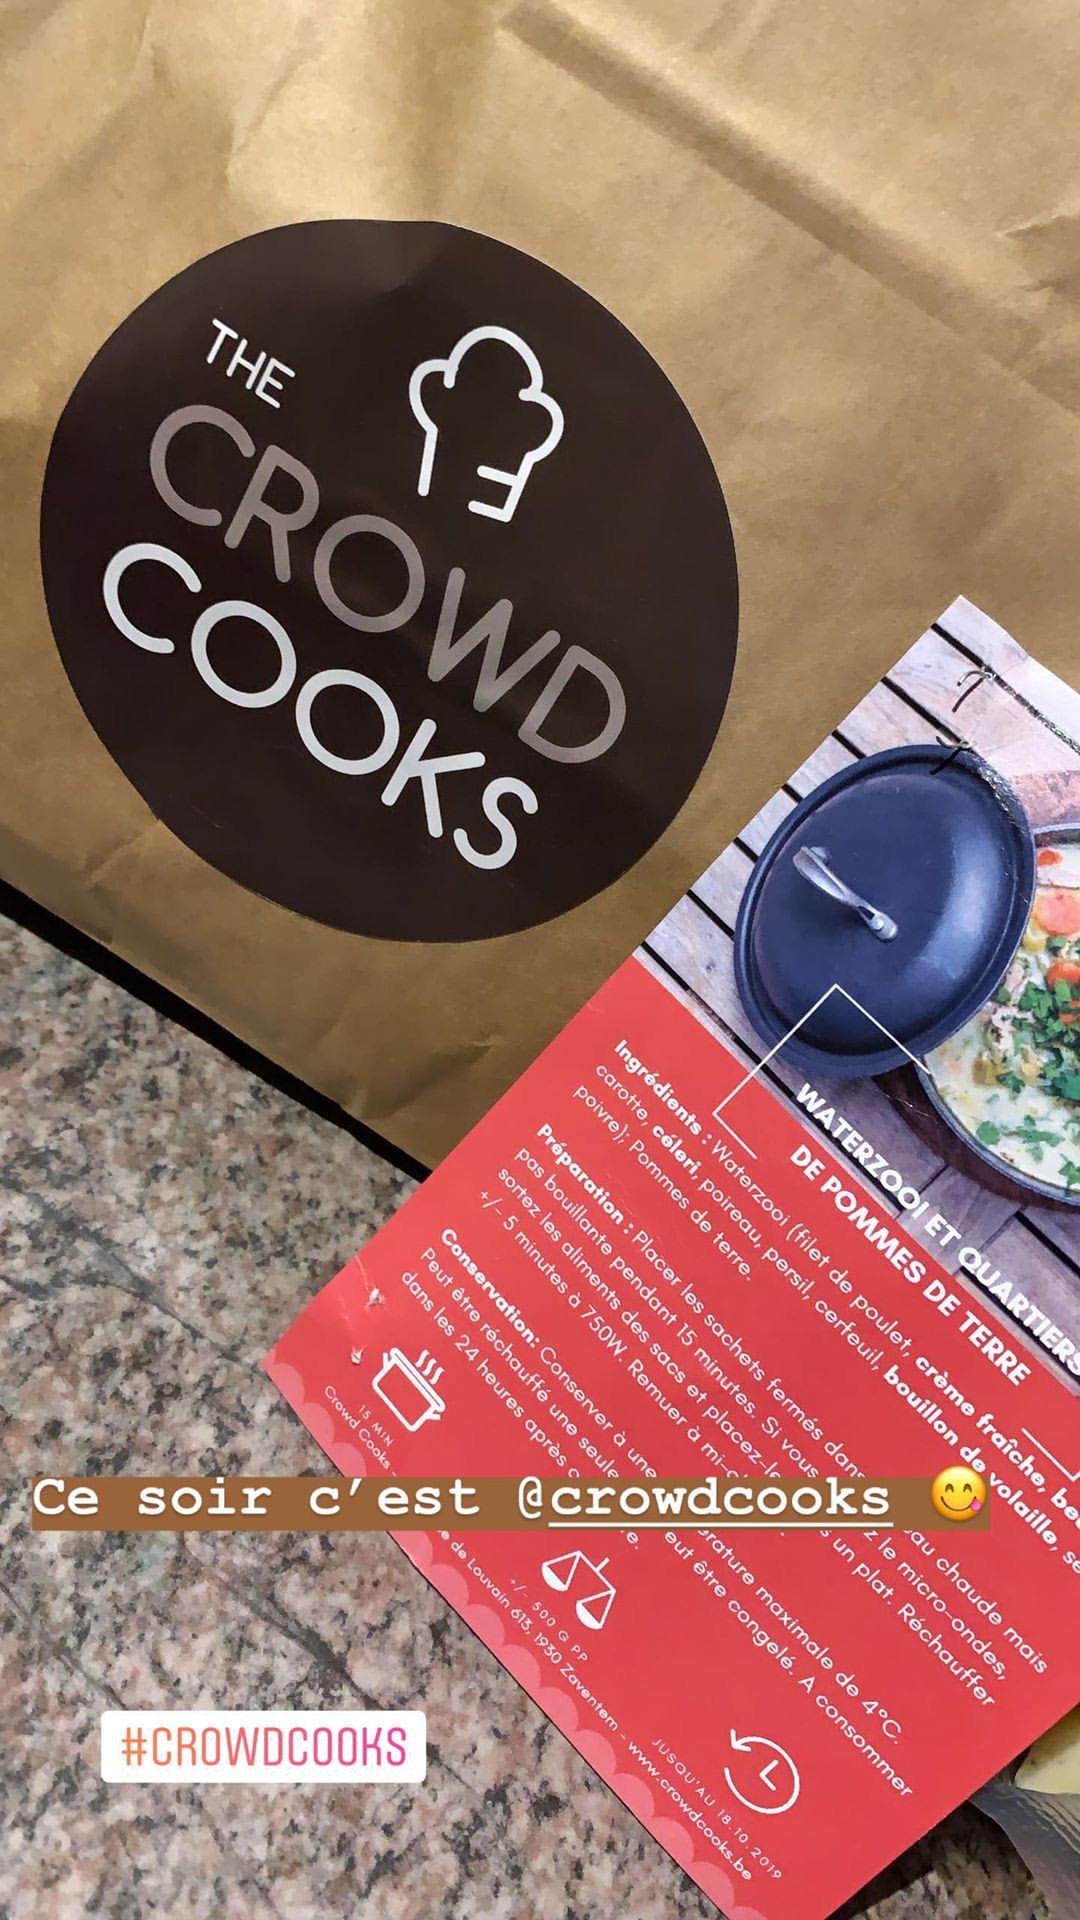 Crowd cooks box repas